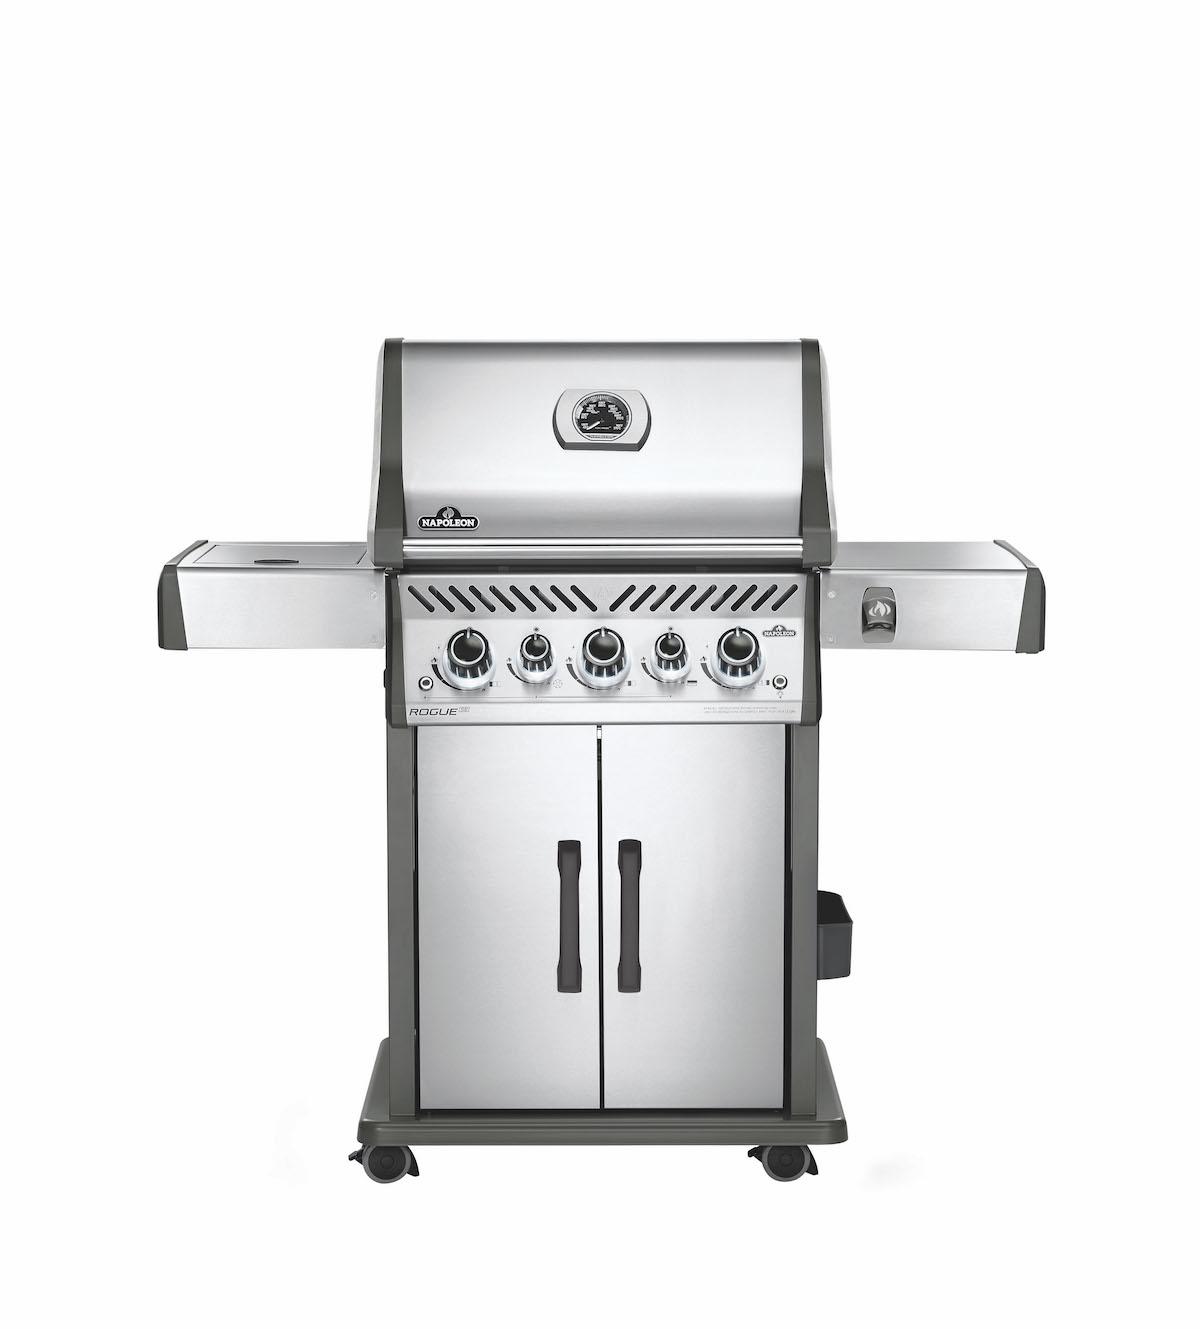 napoleon rogue 425 se stainless steel jetzt online kaufen grill concept. Black Bedroom Furniture Sets. Home Design Ideas